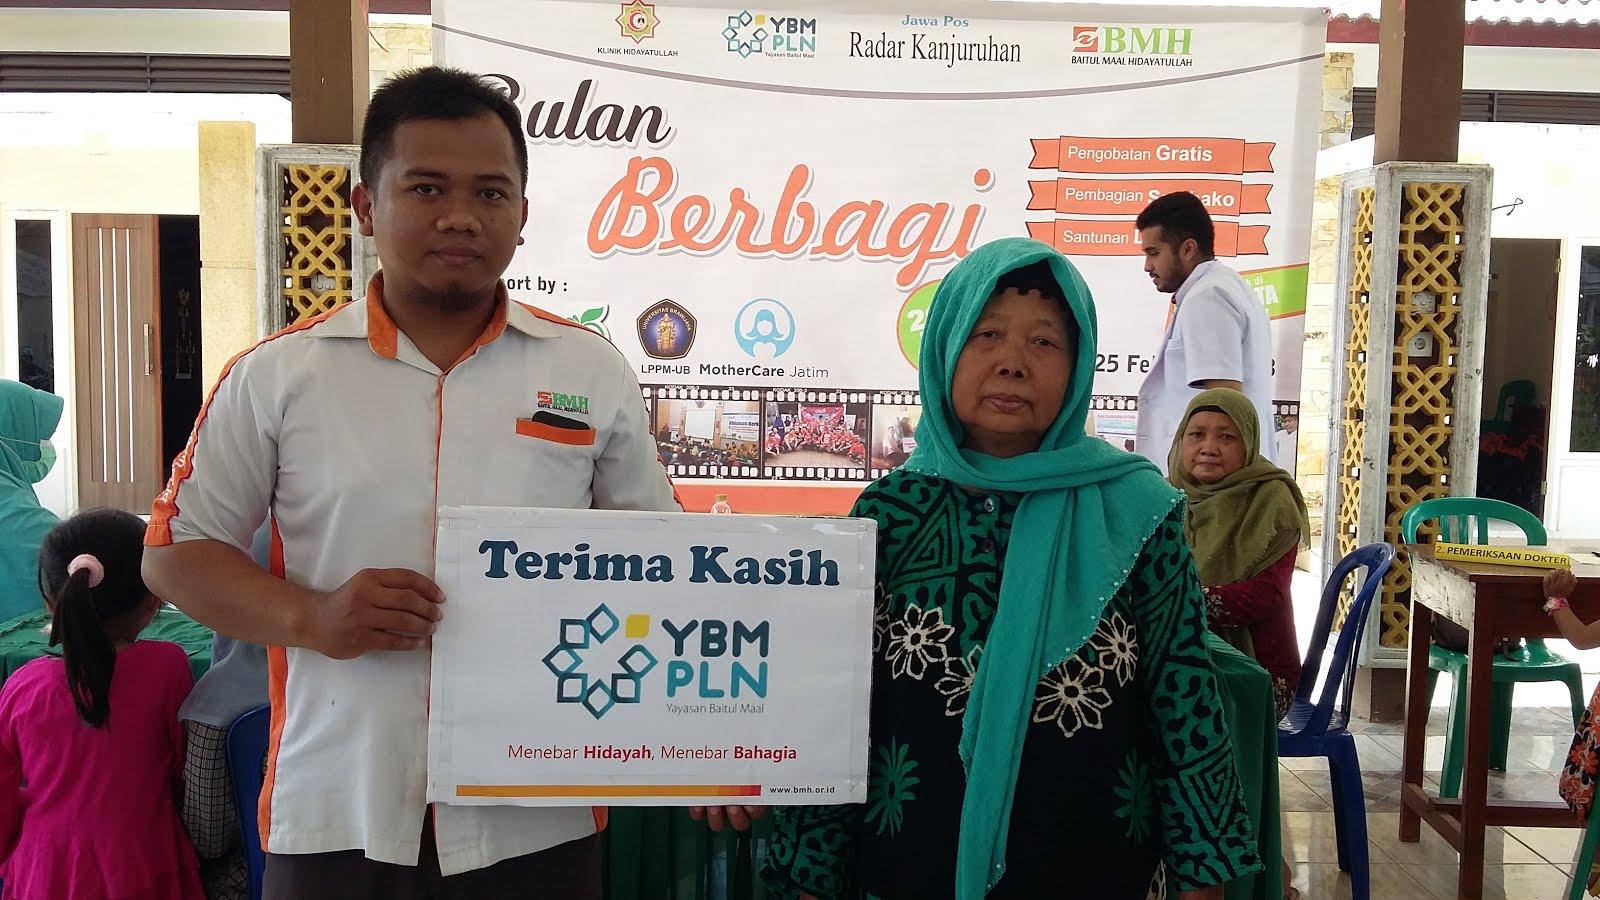 Alamat Kantor Bmh Se Indonesia Gerai Malang Grapari Halo 12 Bulan Layanan